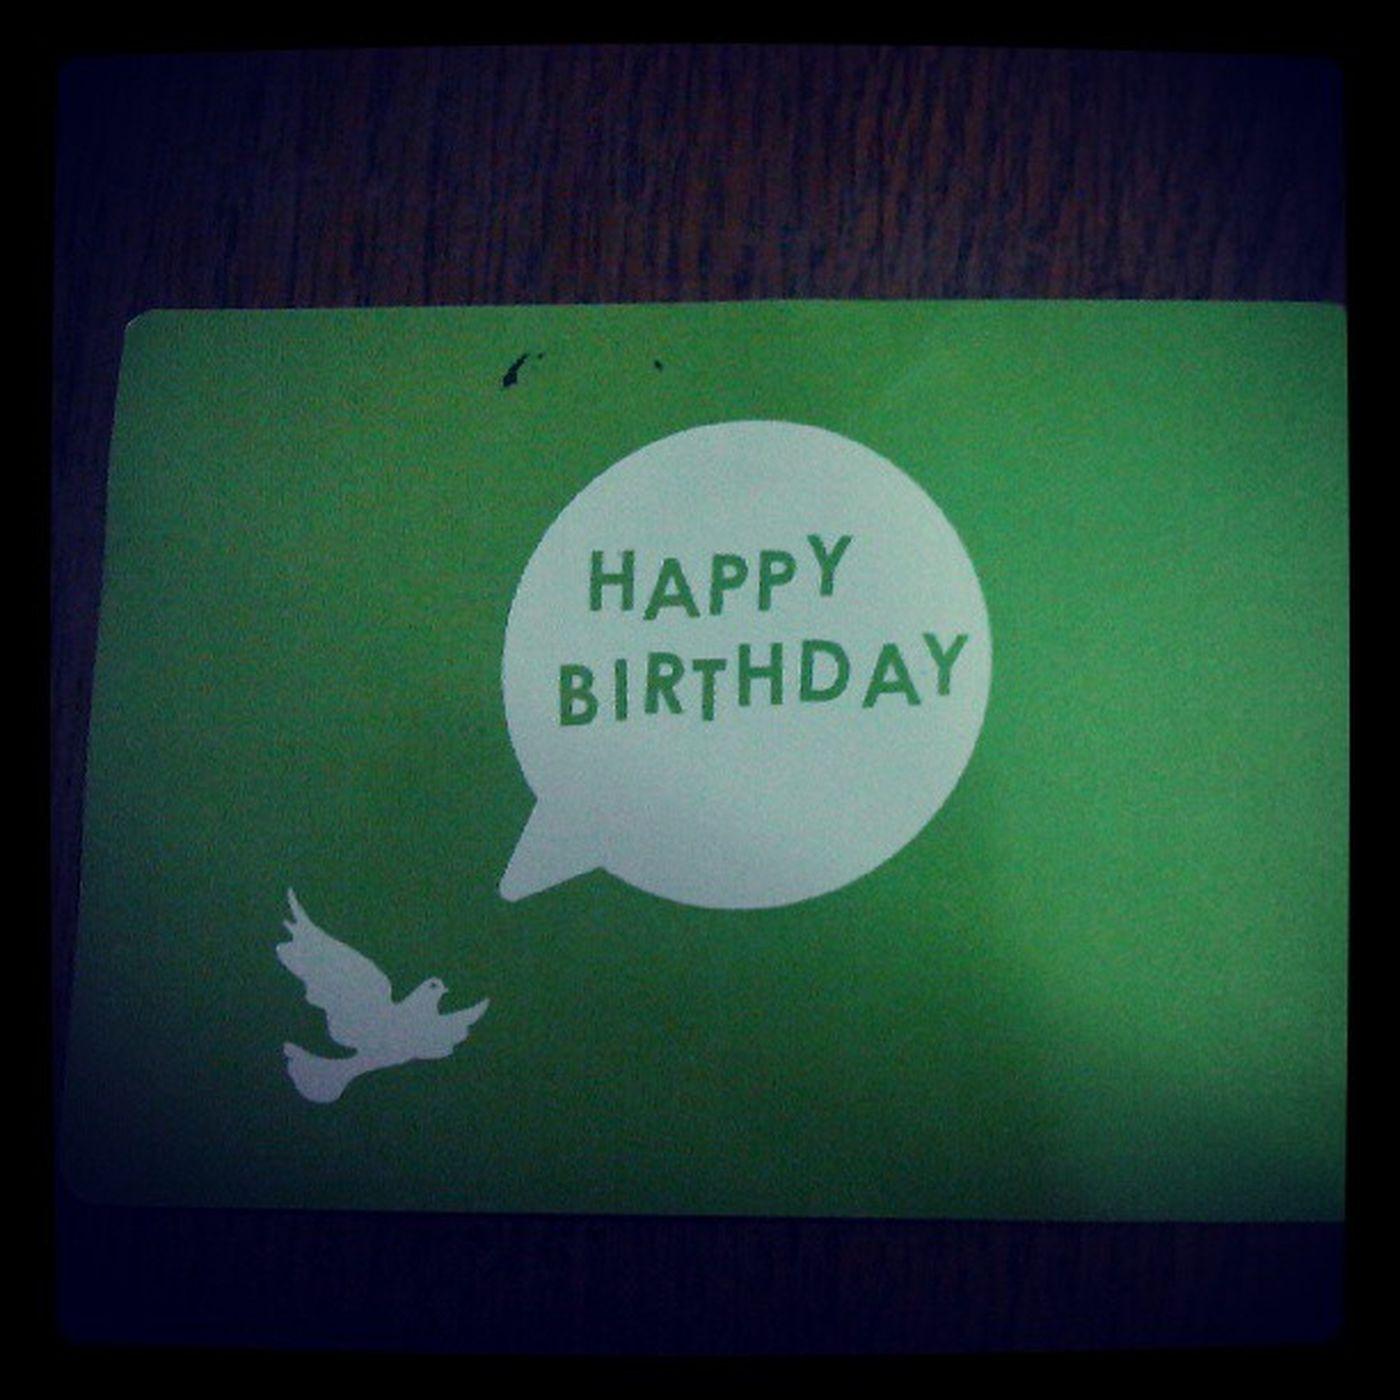 Greeting card from DPHK Greetingcard Dphk